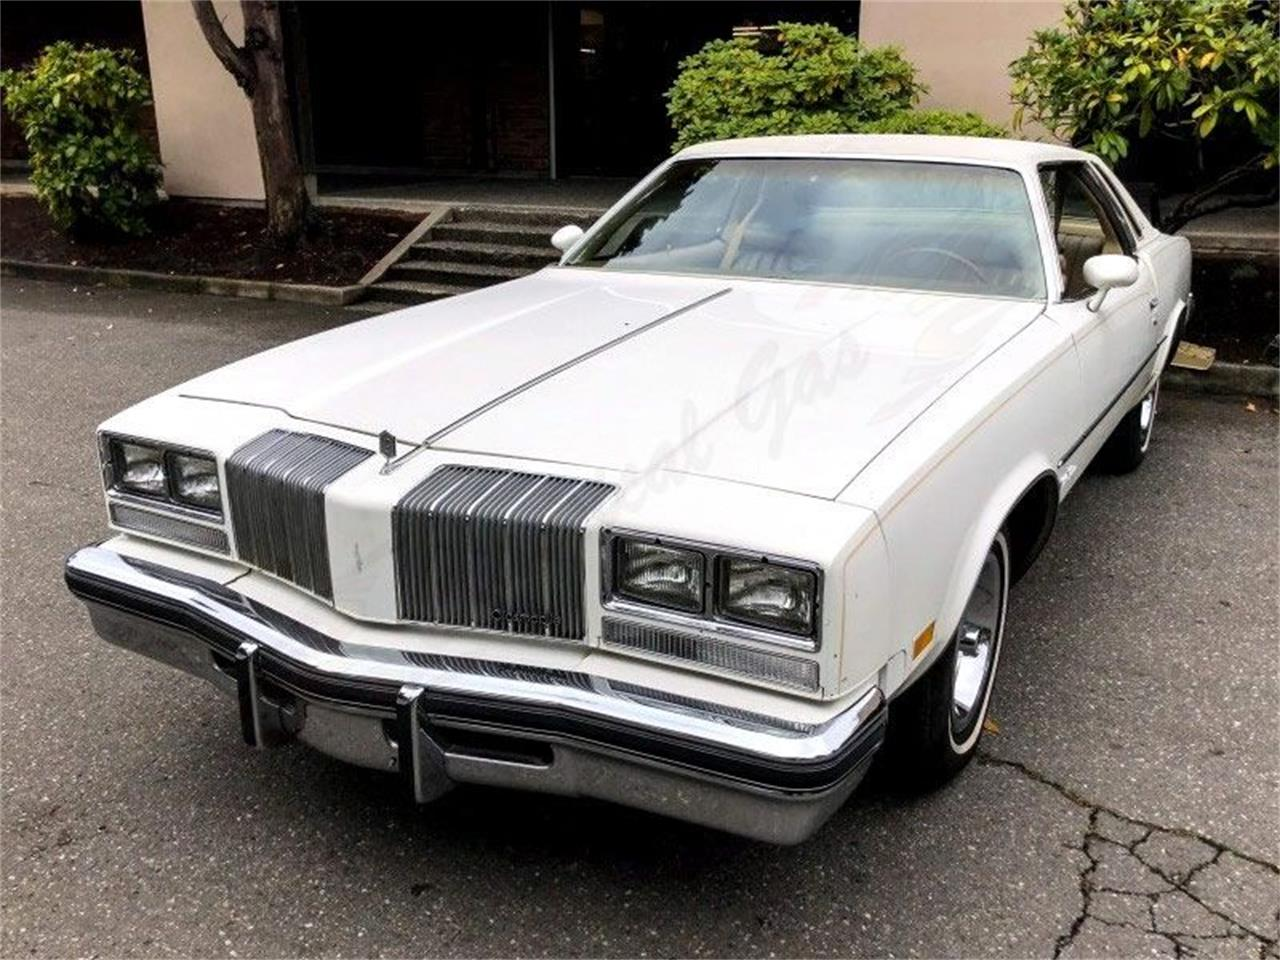 1977 Oldsmobile Cutlass Supreme For Sale Classiccars Com Cc 1168762 Rh 76 74